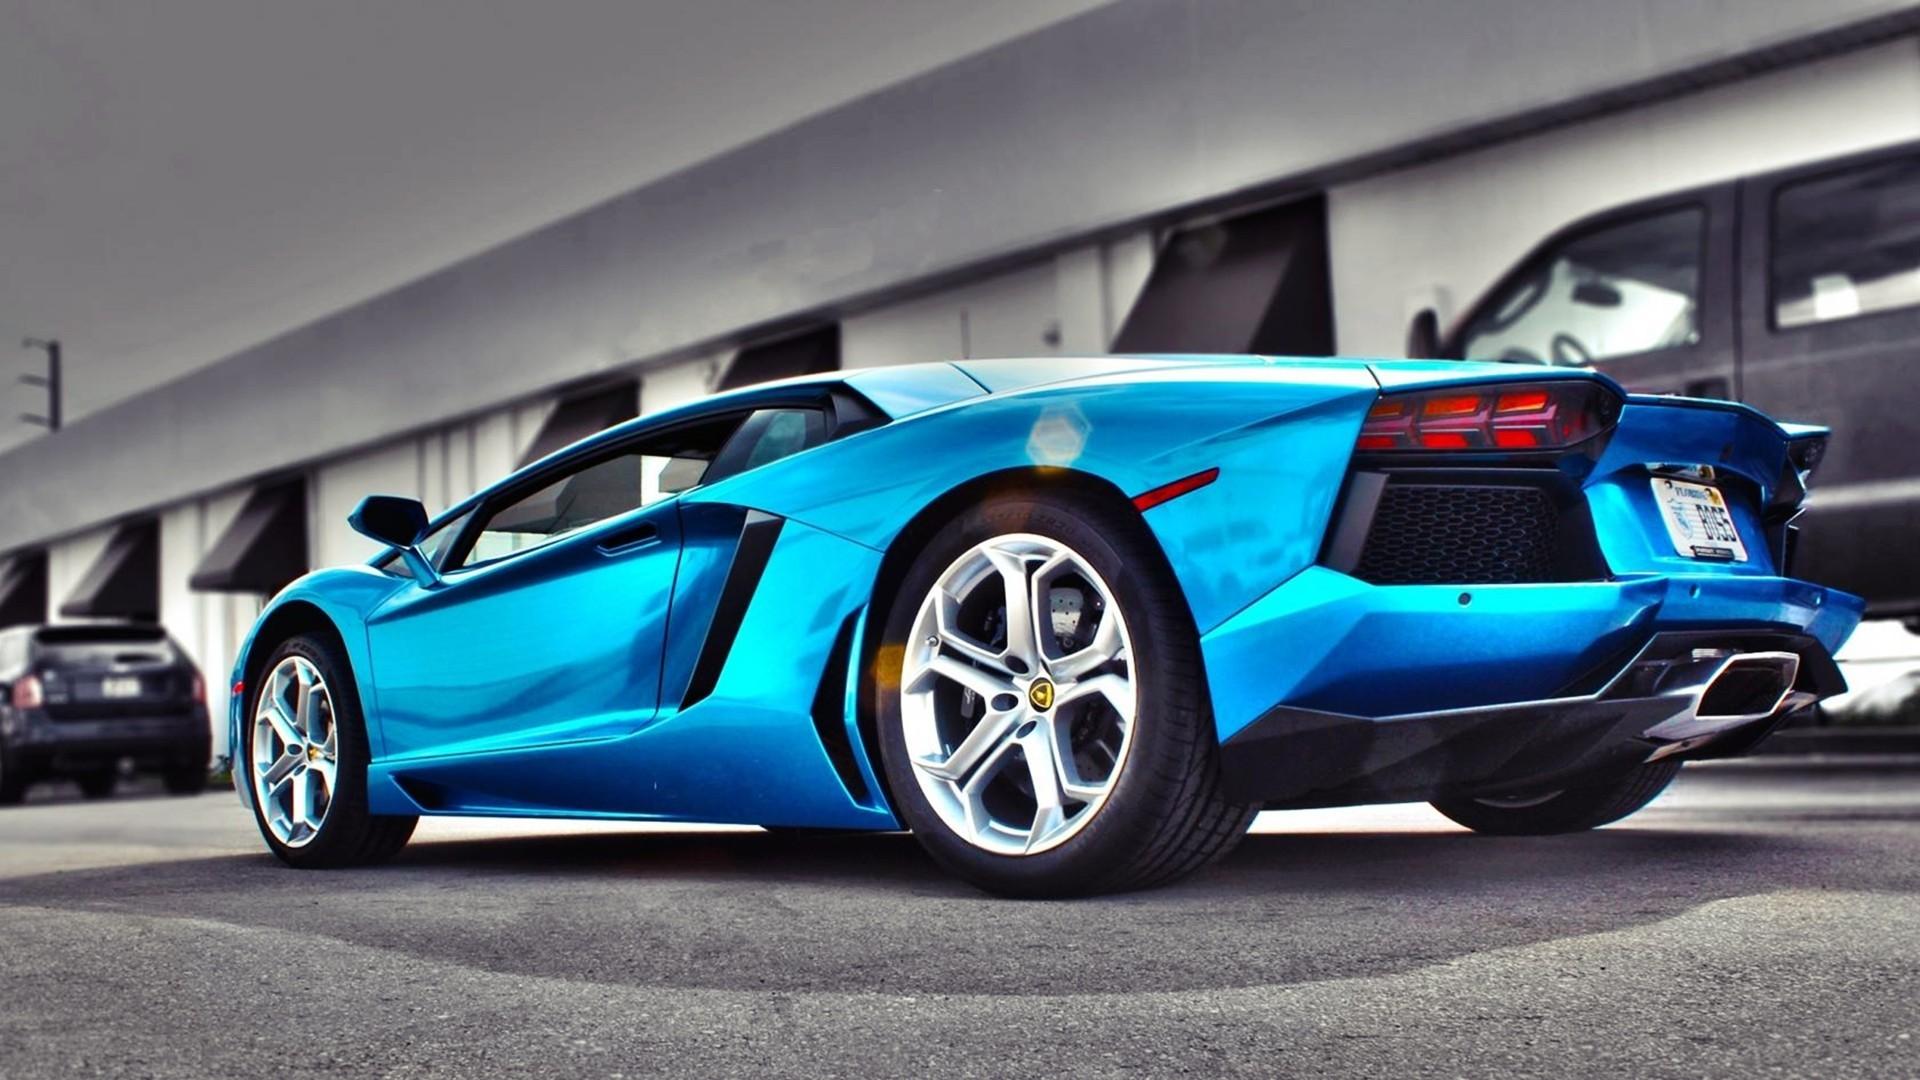 Lamborghini Lamborghini Aventador Lamborghini Aventador LP700-4 cars exotic cars